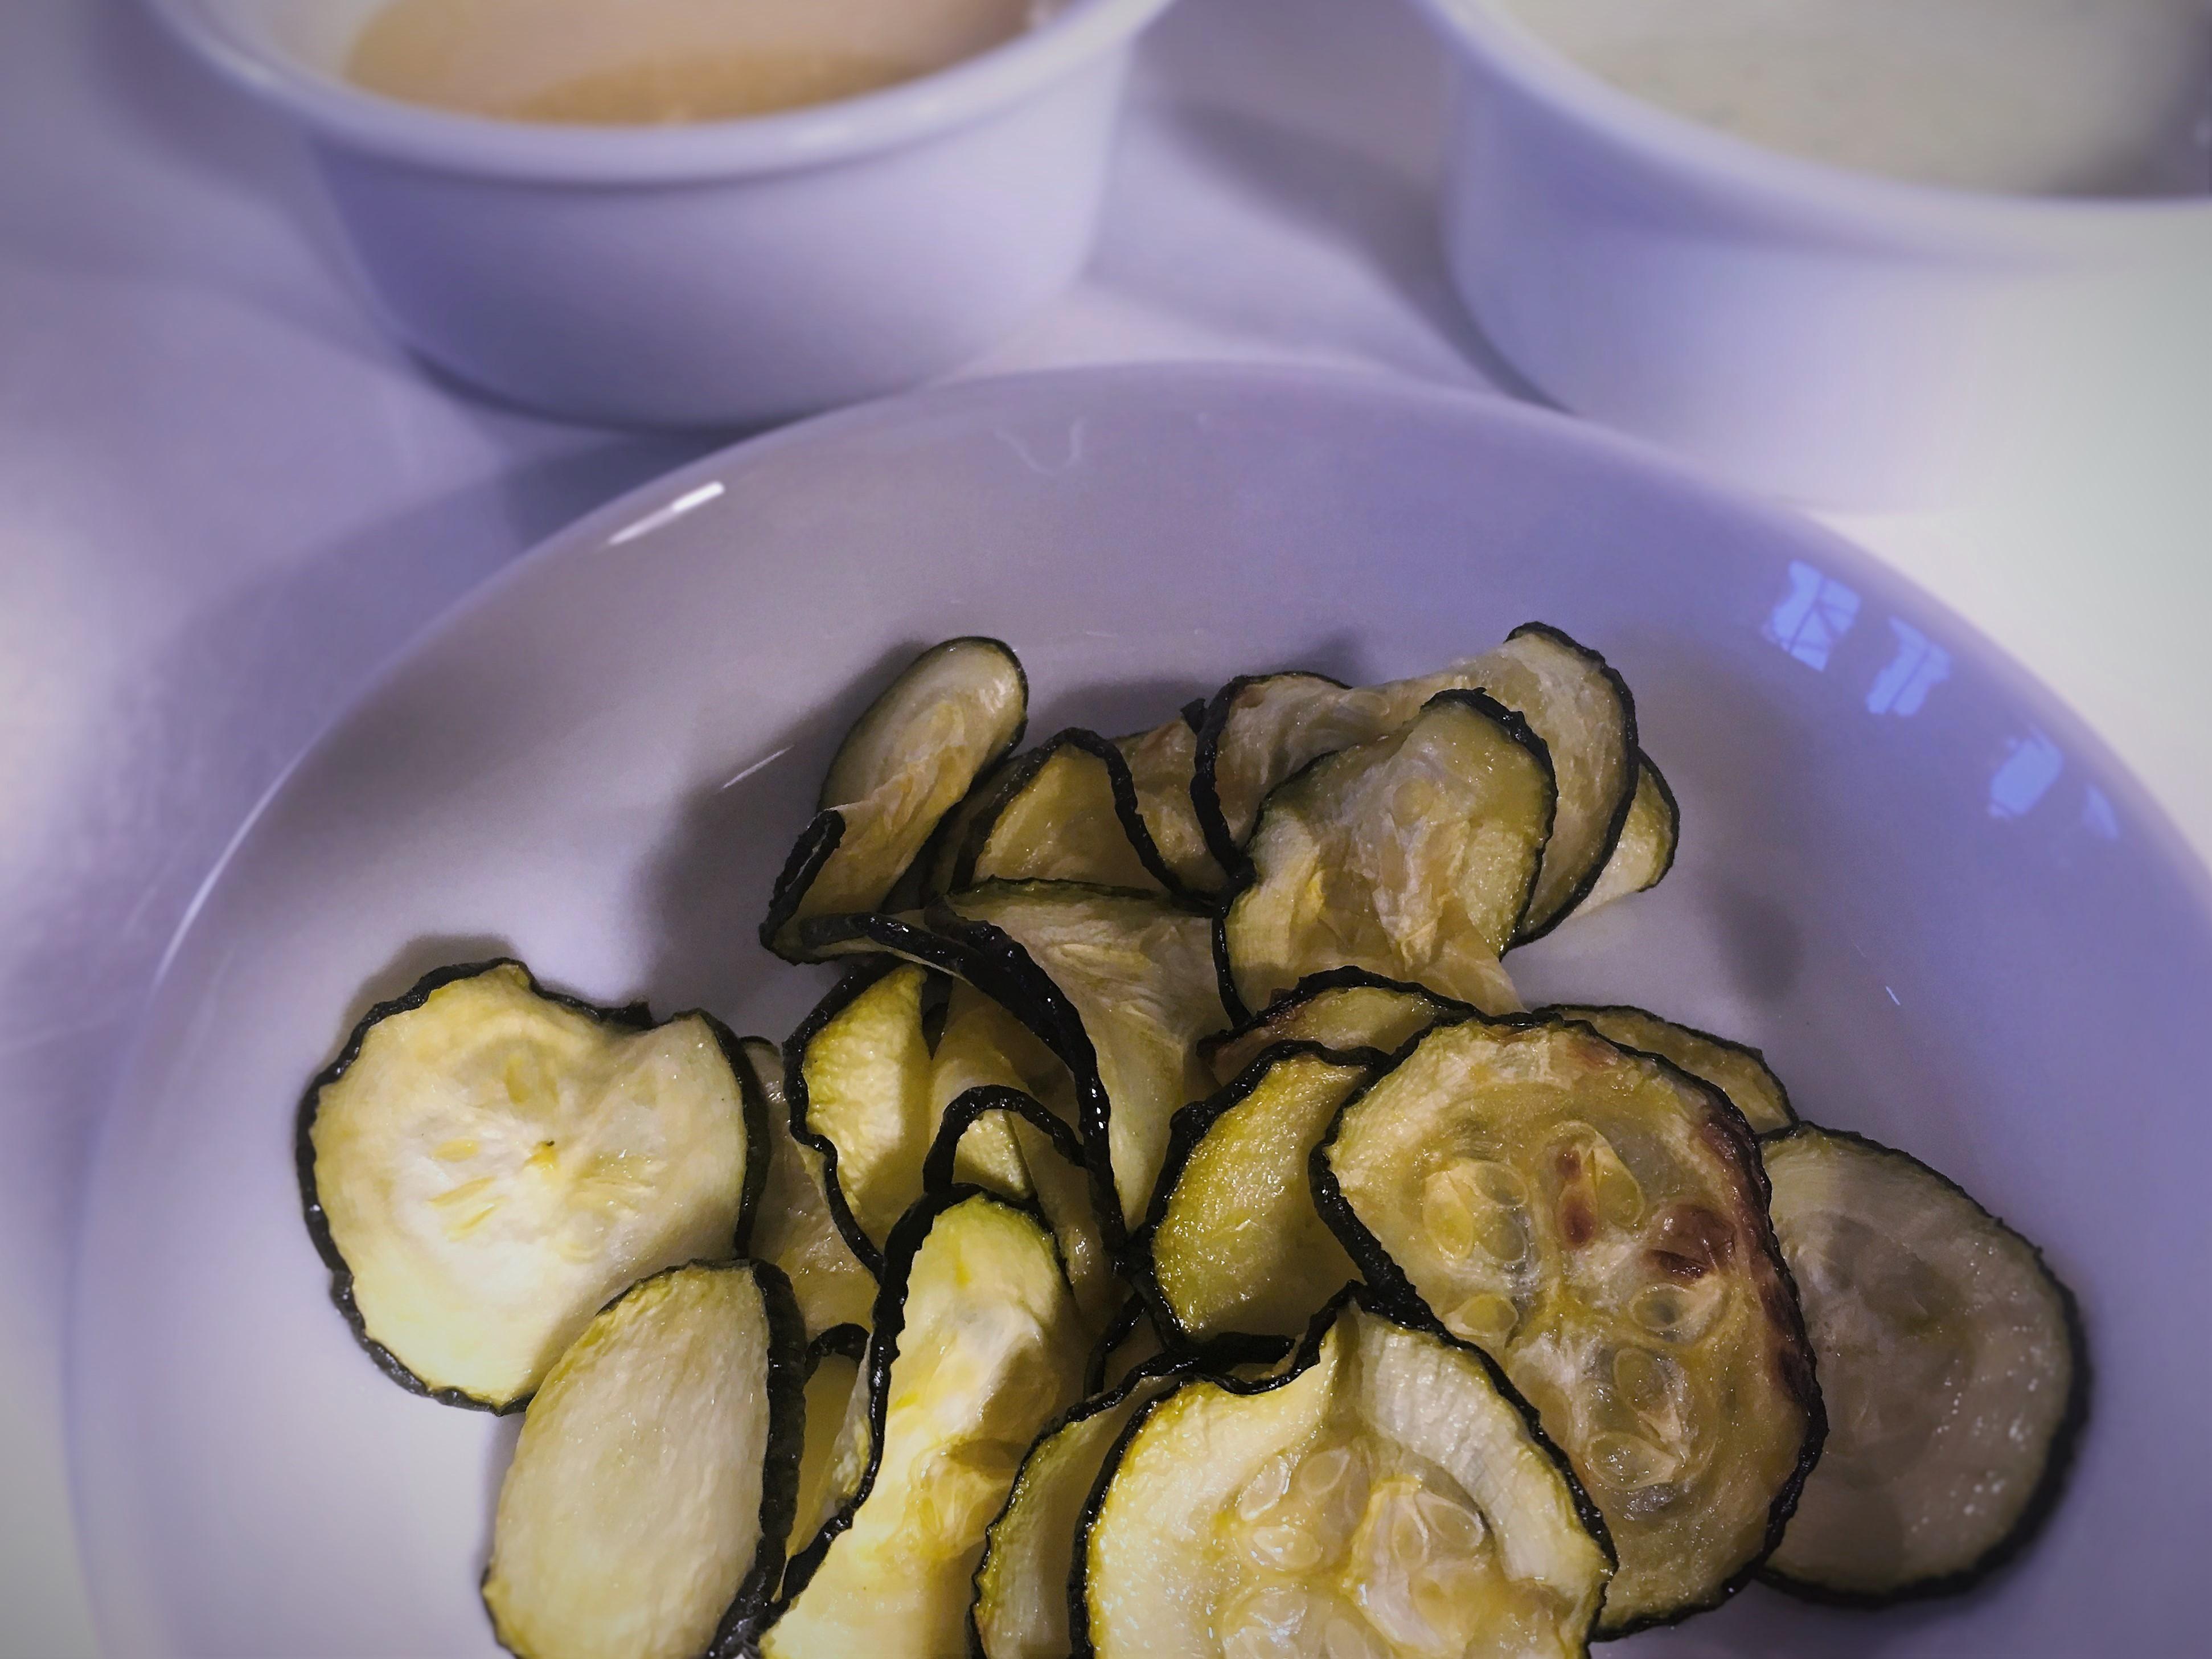 Chips, ovn, squash, zucchini, opskrift, superotium, nemt, sjovt